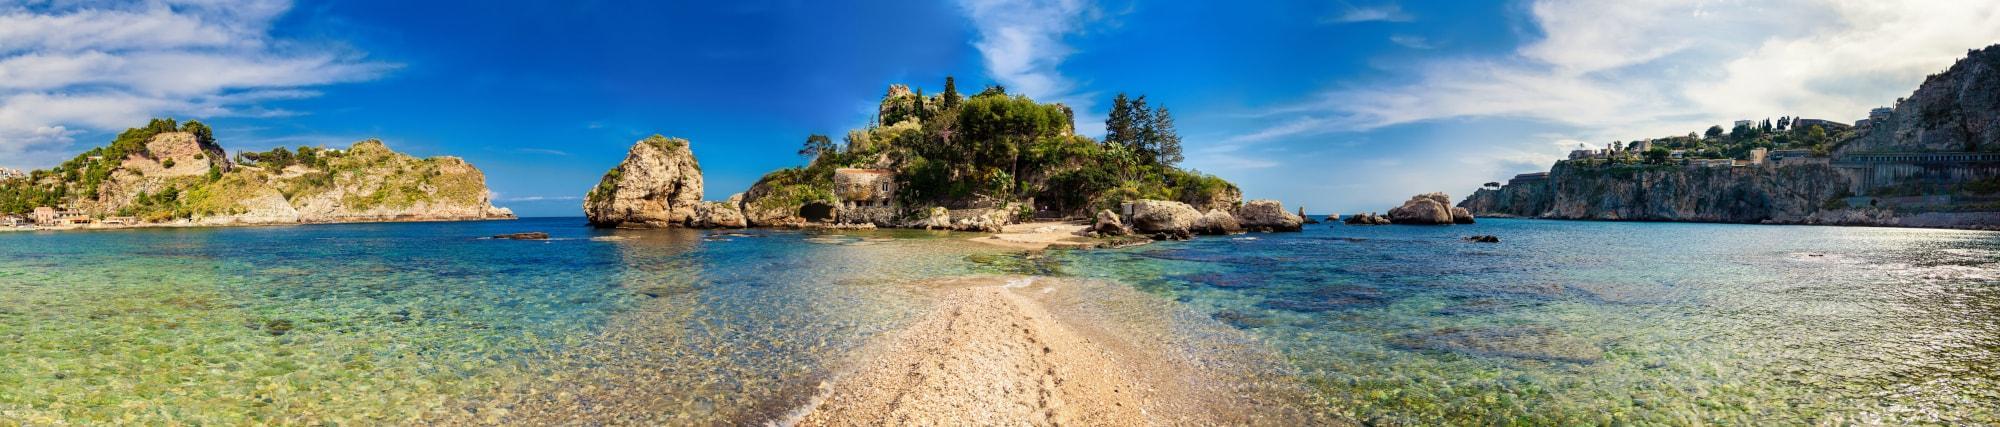 Panorama dell'Isola Bella a Taormina